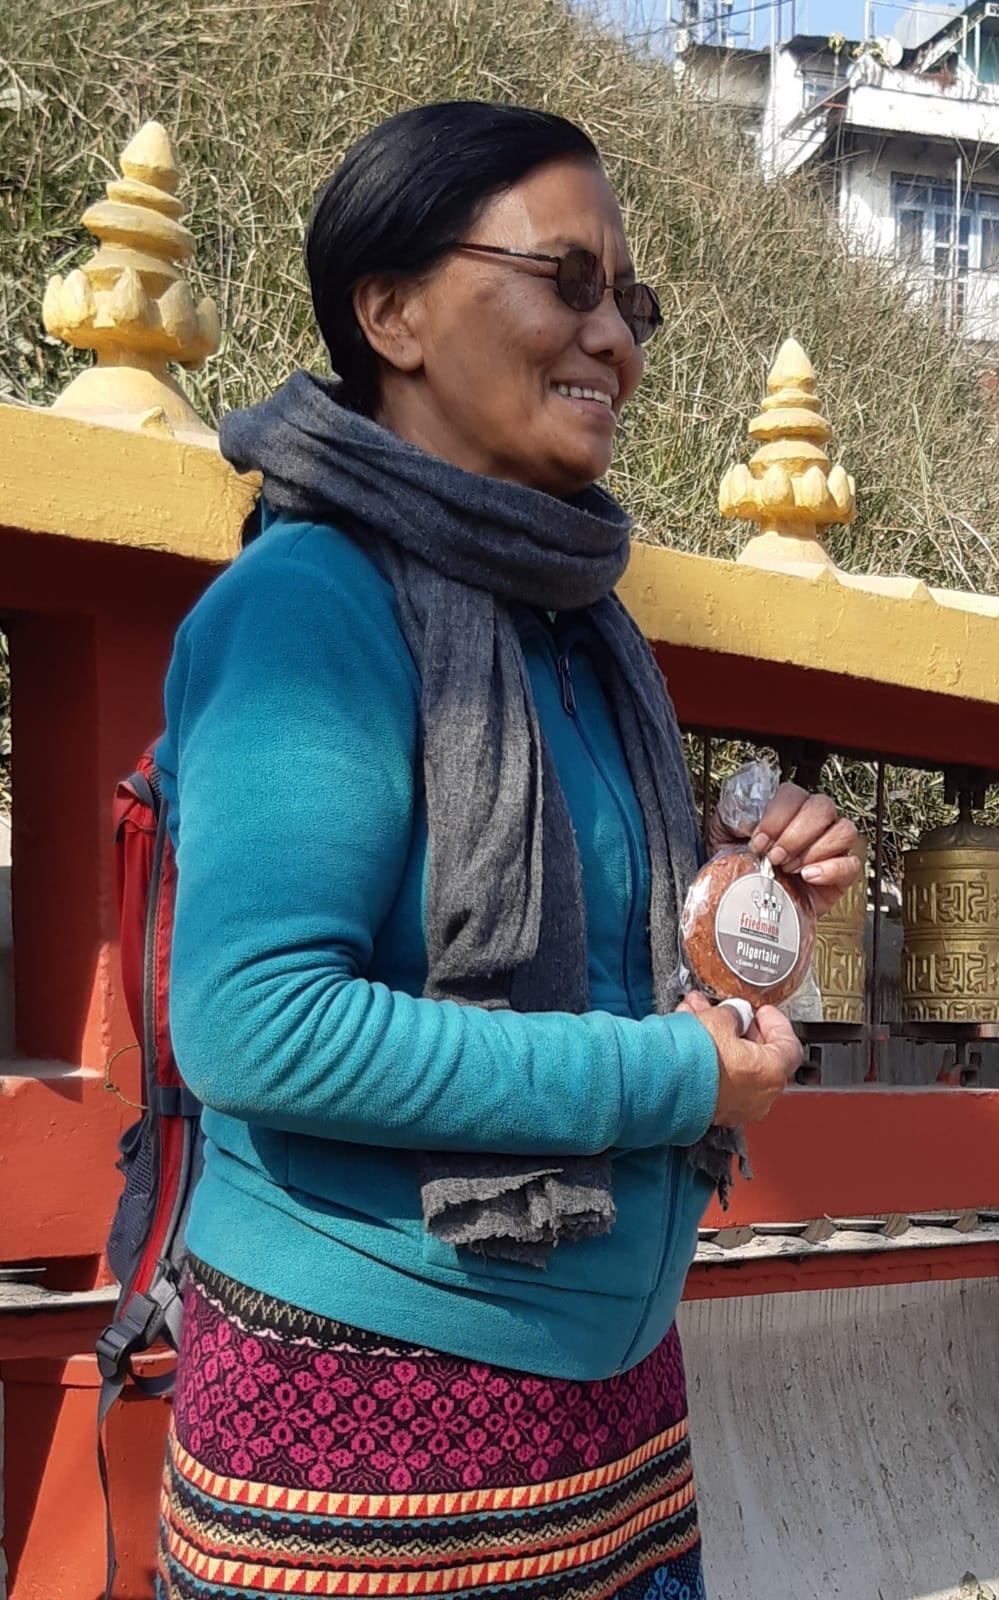 Asien Nepal Himalaya, Dec. 2019